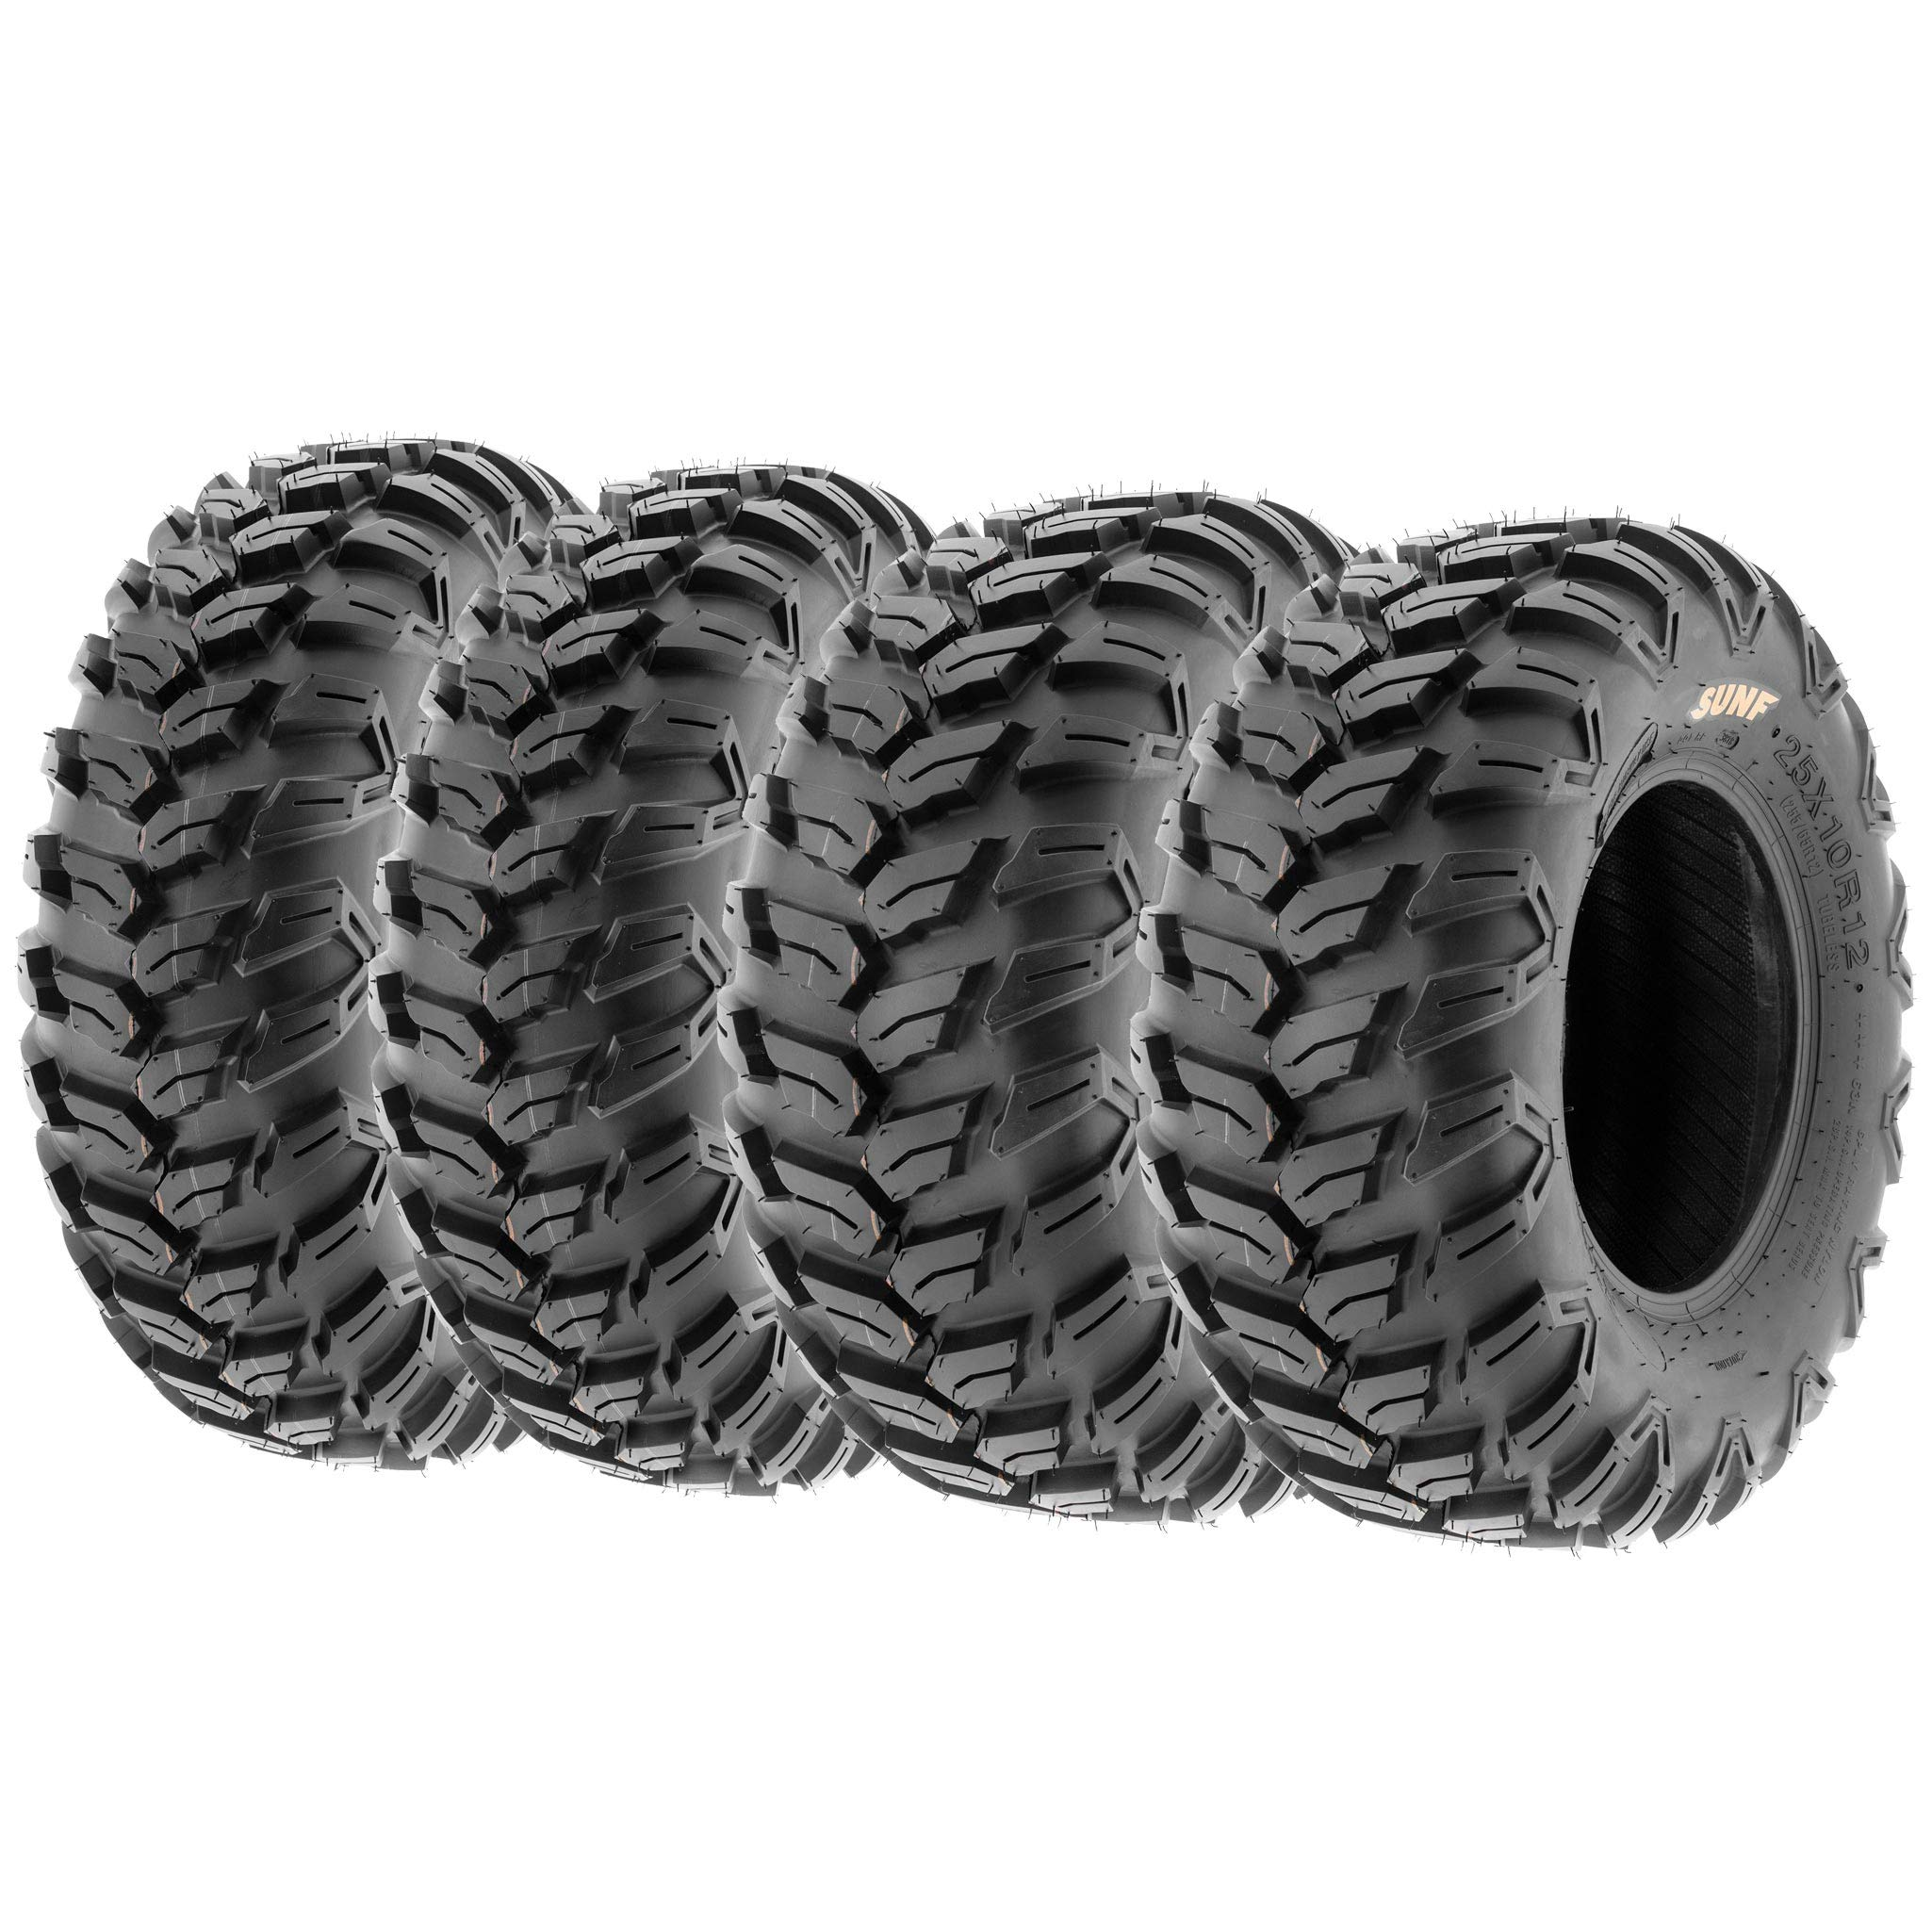 Set of 4 SunF A043 XC Racing ATV UTV Radial Sport Tires 25x8R12 Front & 25x10R12 Rear, 6PR, All-Terrain Off-Road & Track